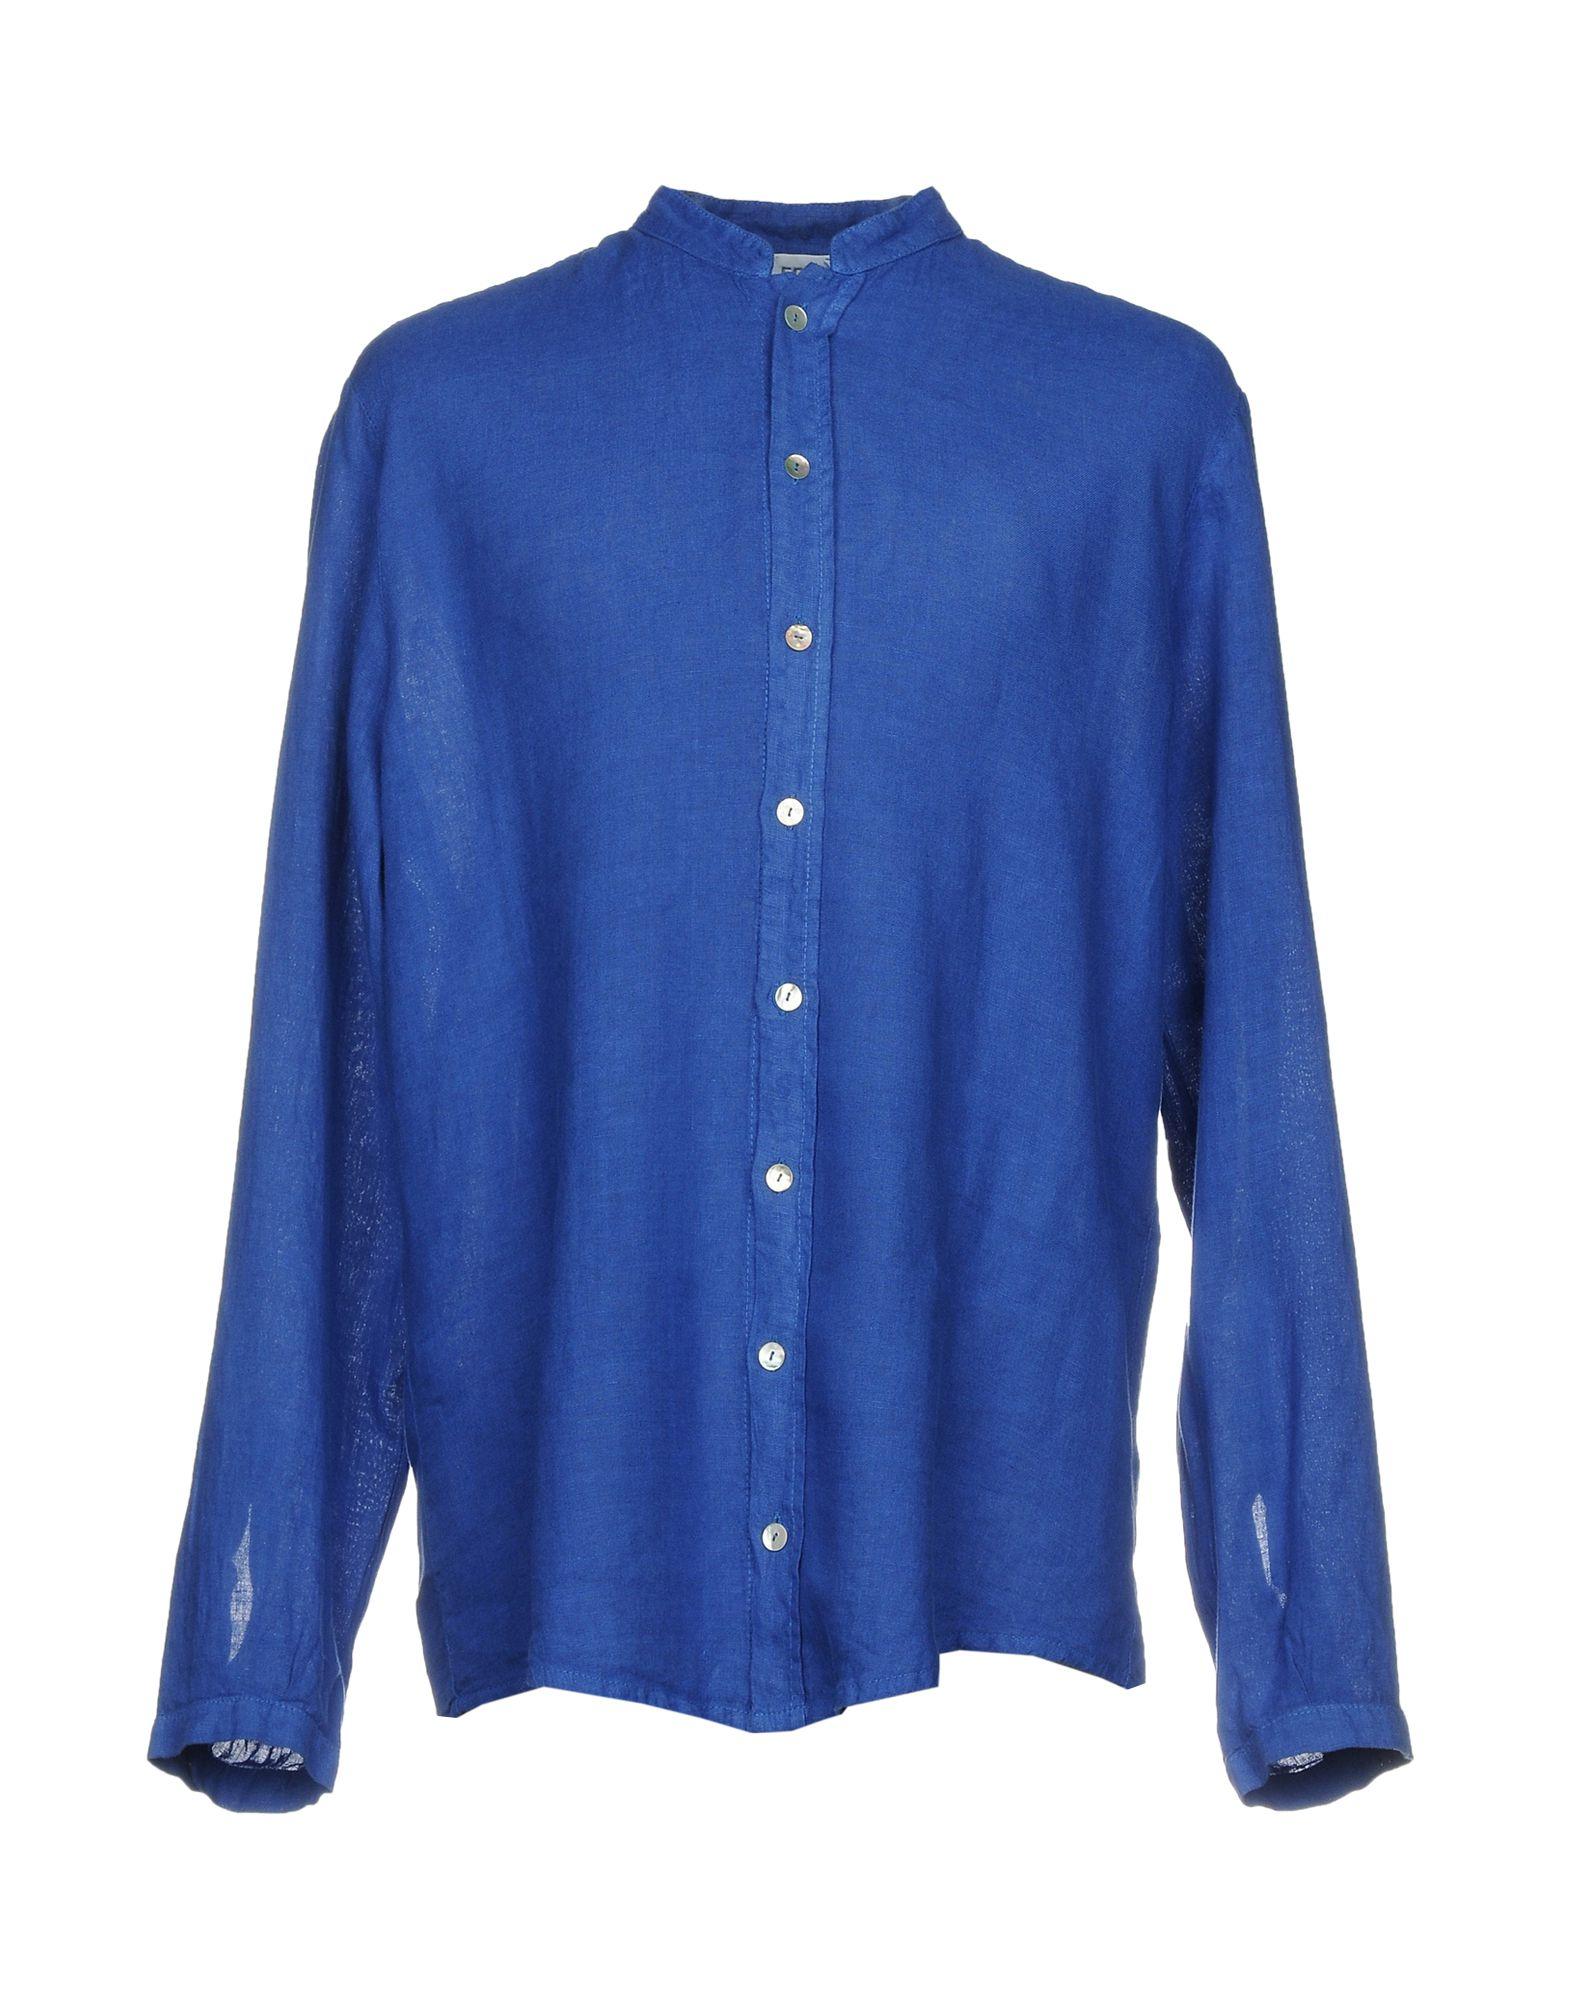 LA FABBRICA del LINO Herren Hemd Farbe Königsblau Größe 7